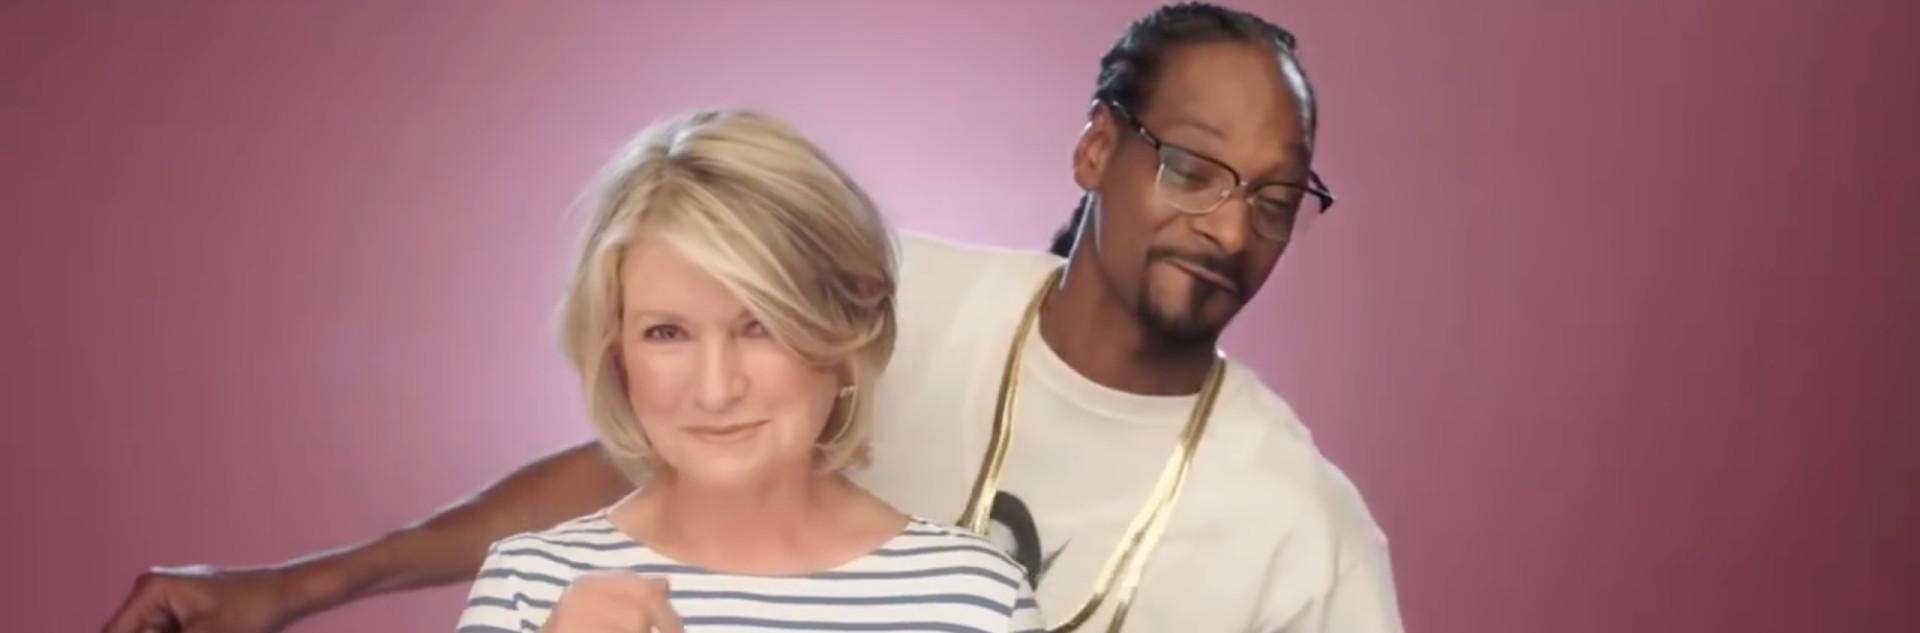 Martha & Snoop'S Potluck Dinner Party  Snoop Dogg and Martha Stewart Do an Interpretive Brownie